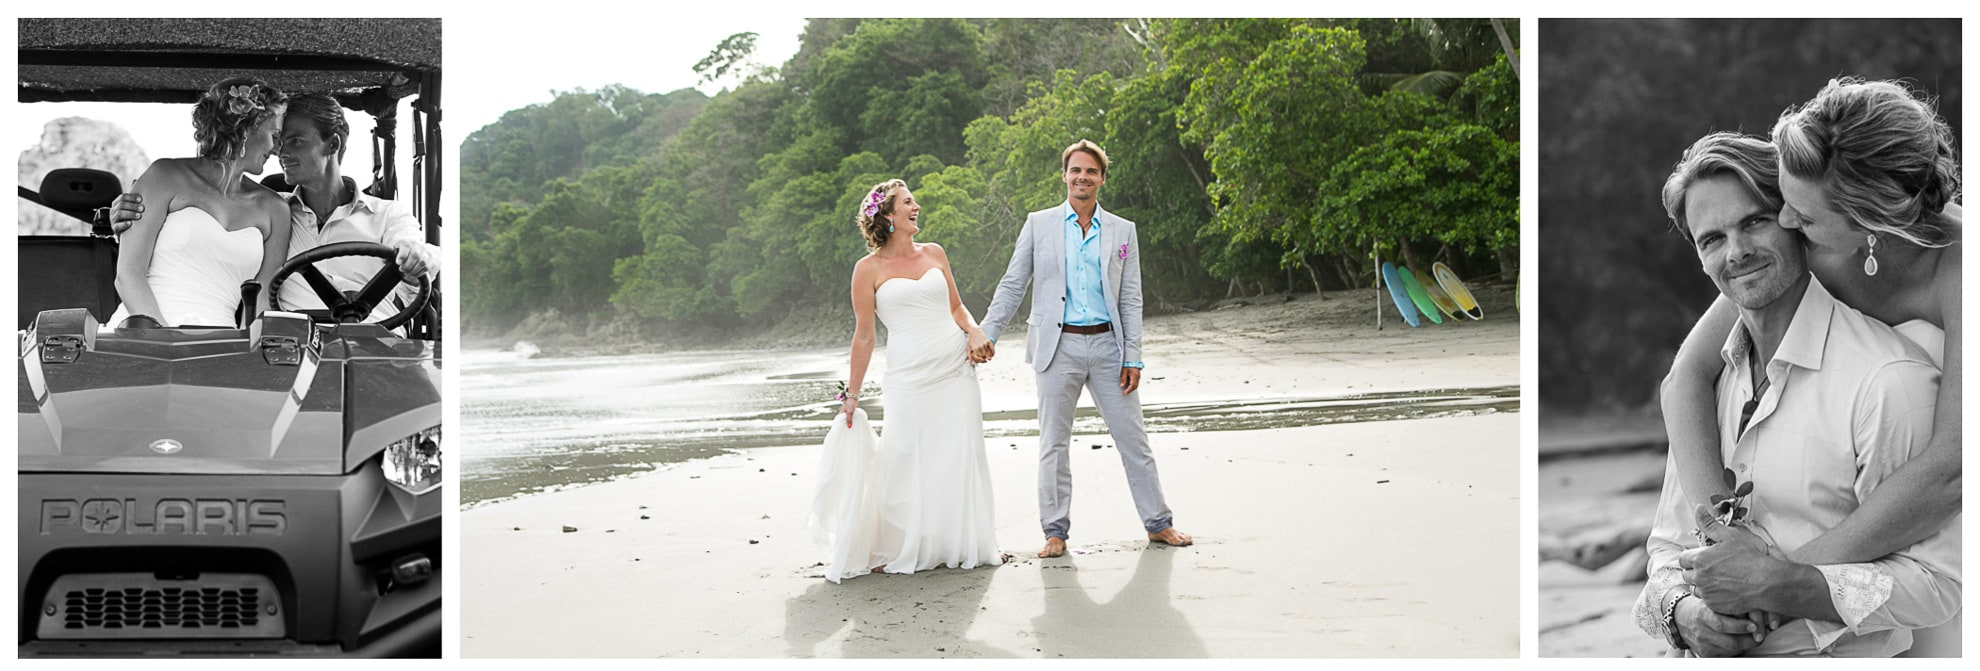 Such a fun destination wedding in Costa Rica!